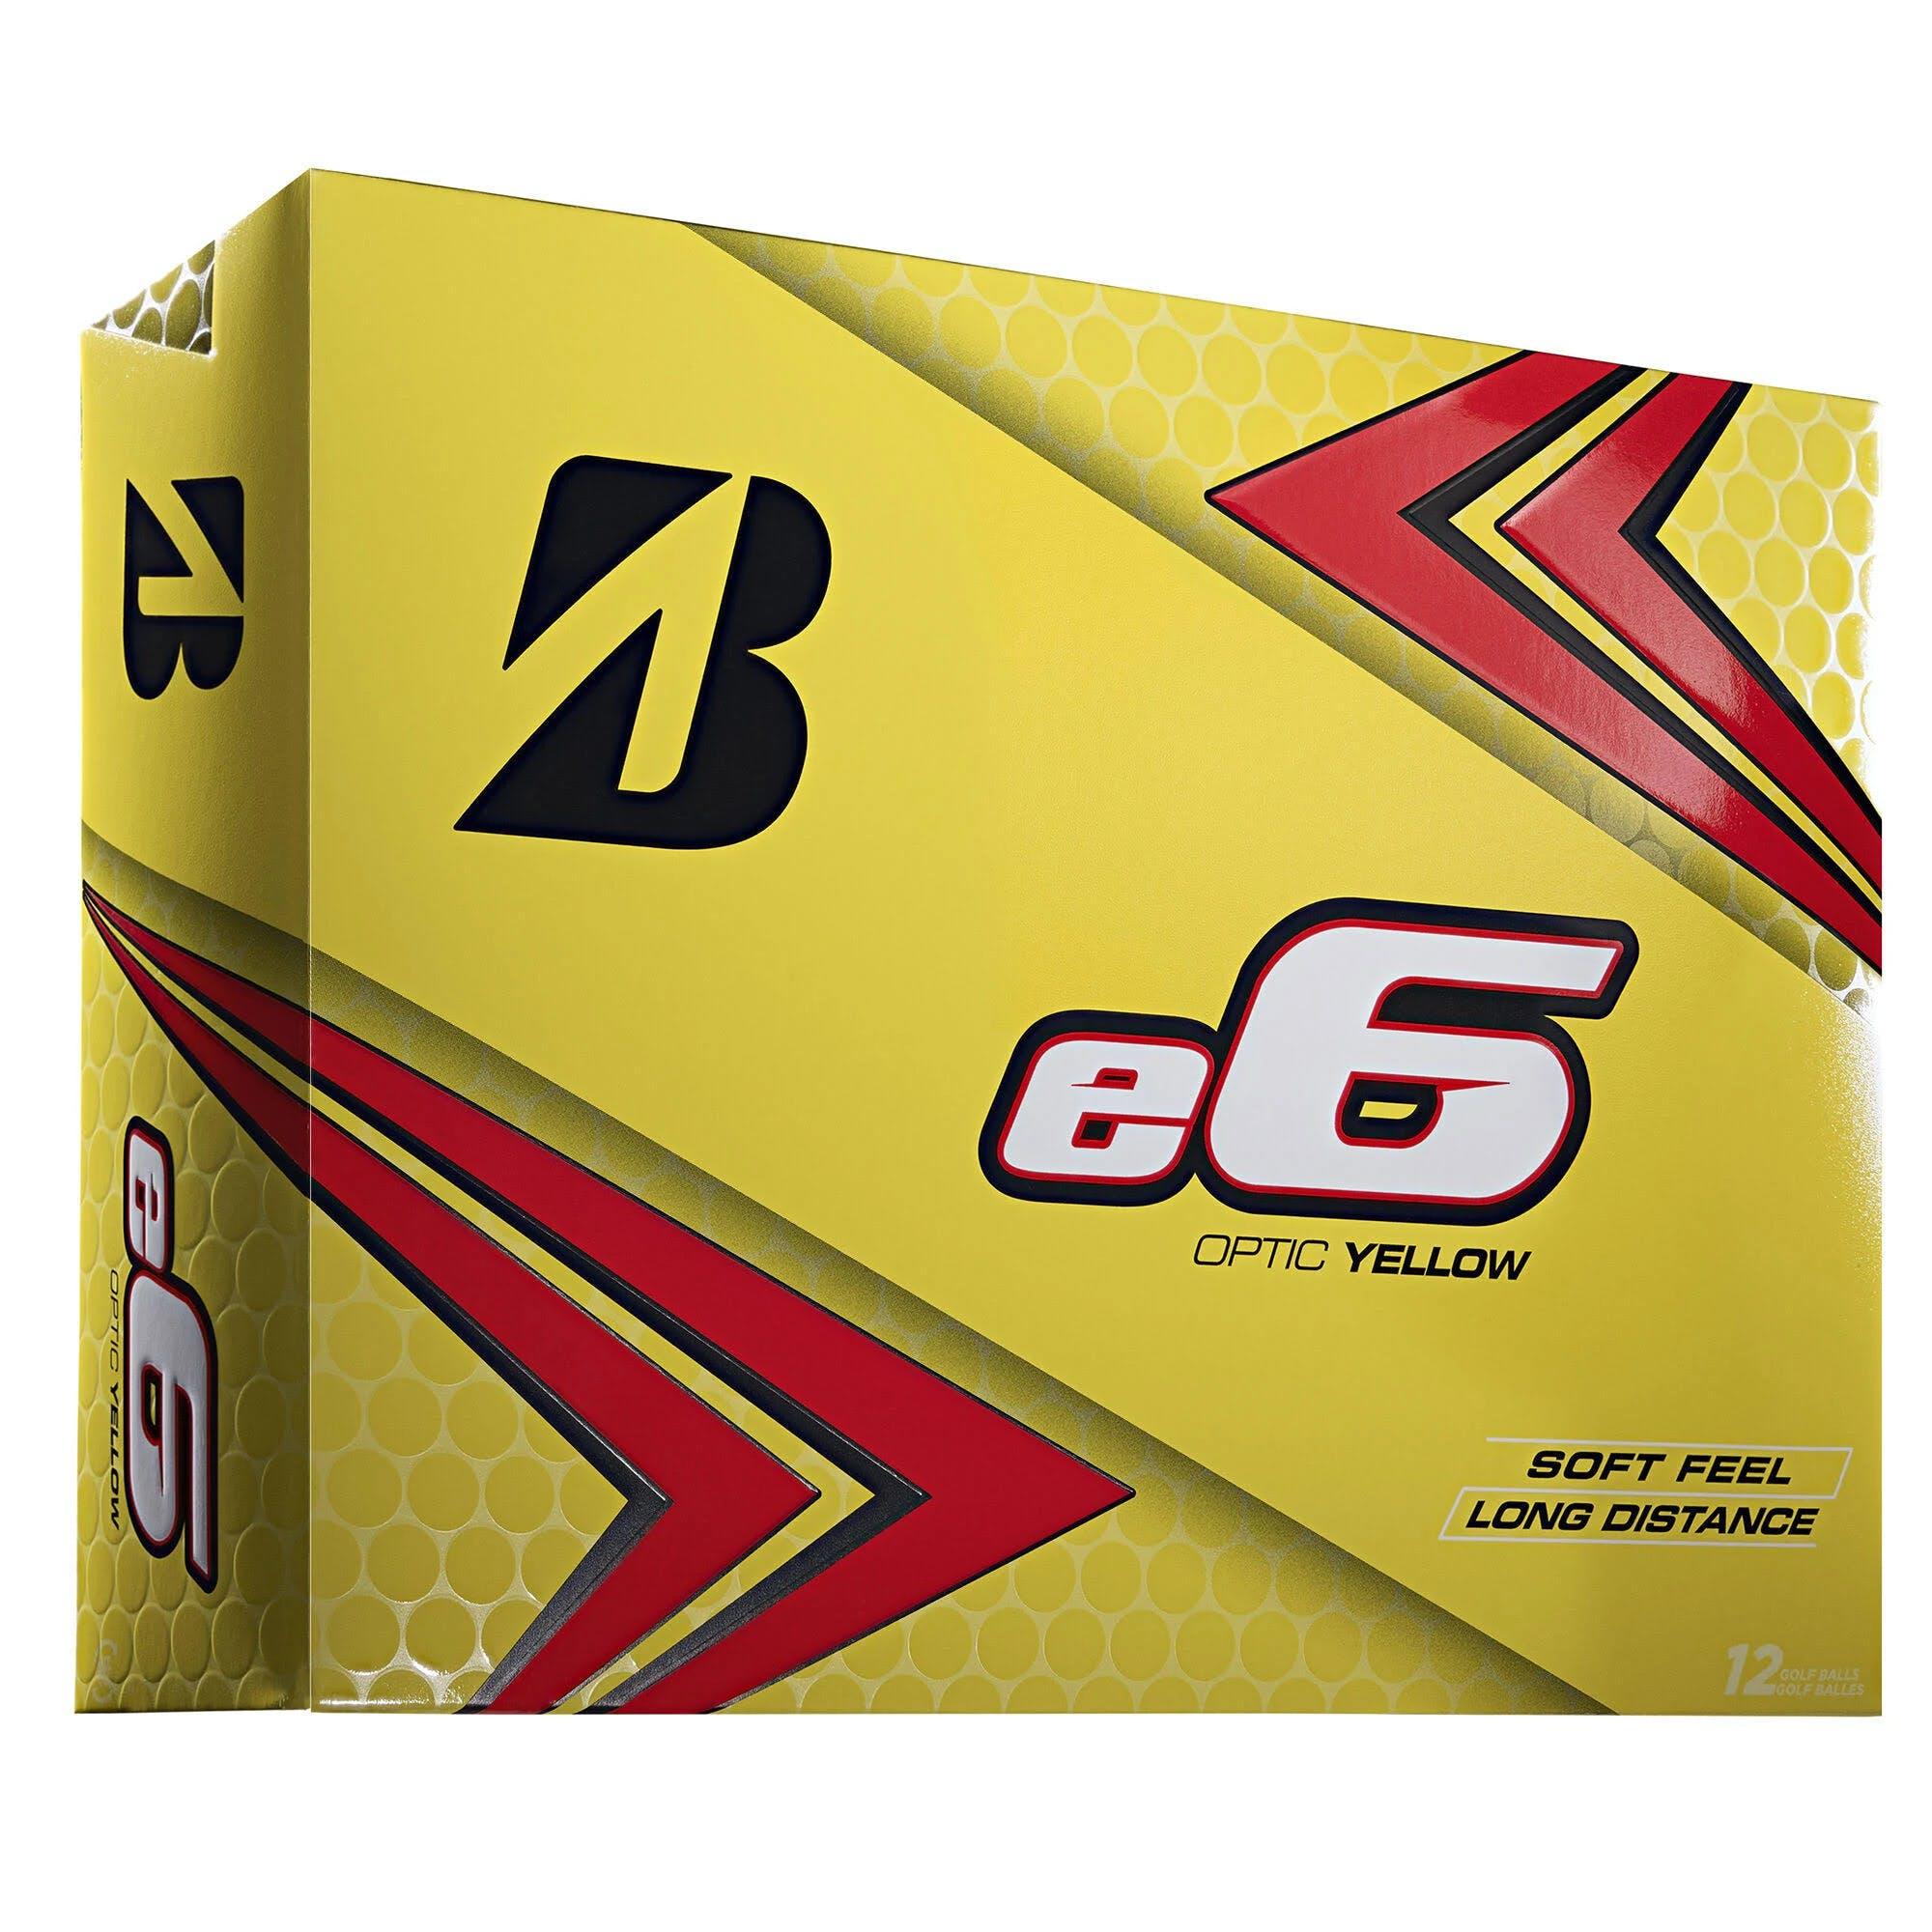 Bridgestone E6 Golf Balls, Yellow